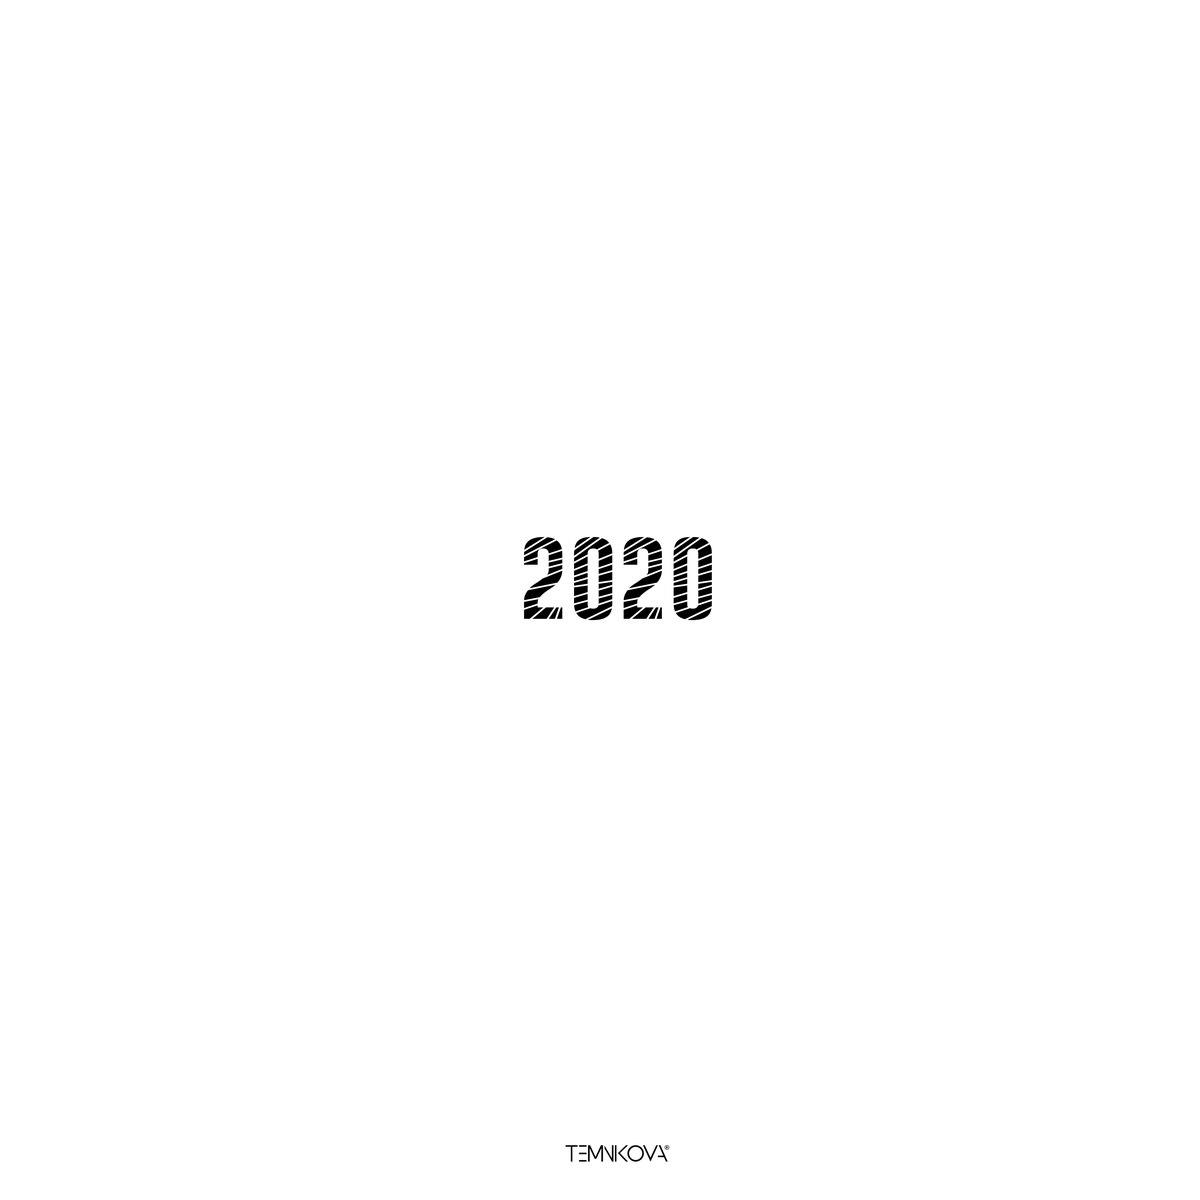 "Премьера! Елена Темникова представила трек-манифест ""2020"" - фото №2"